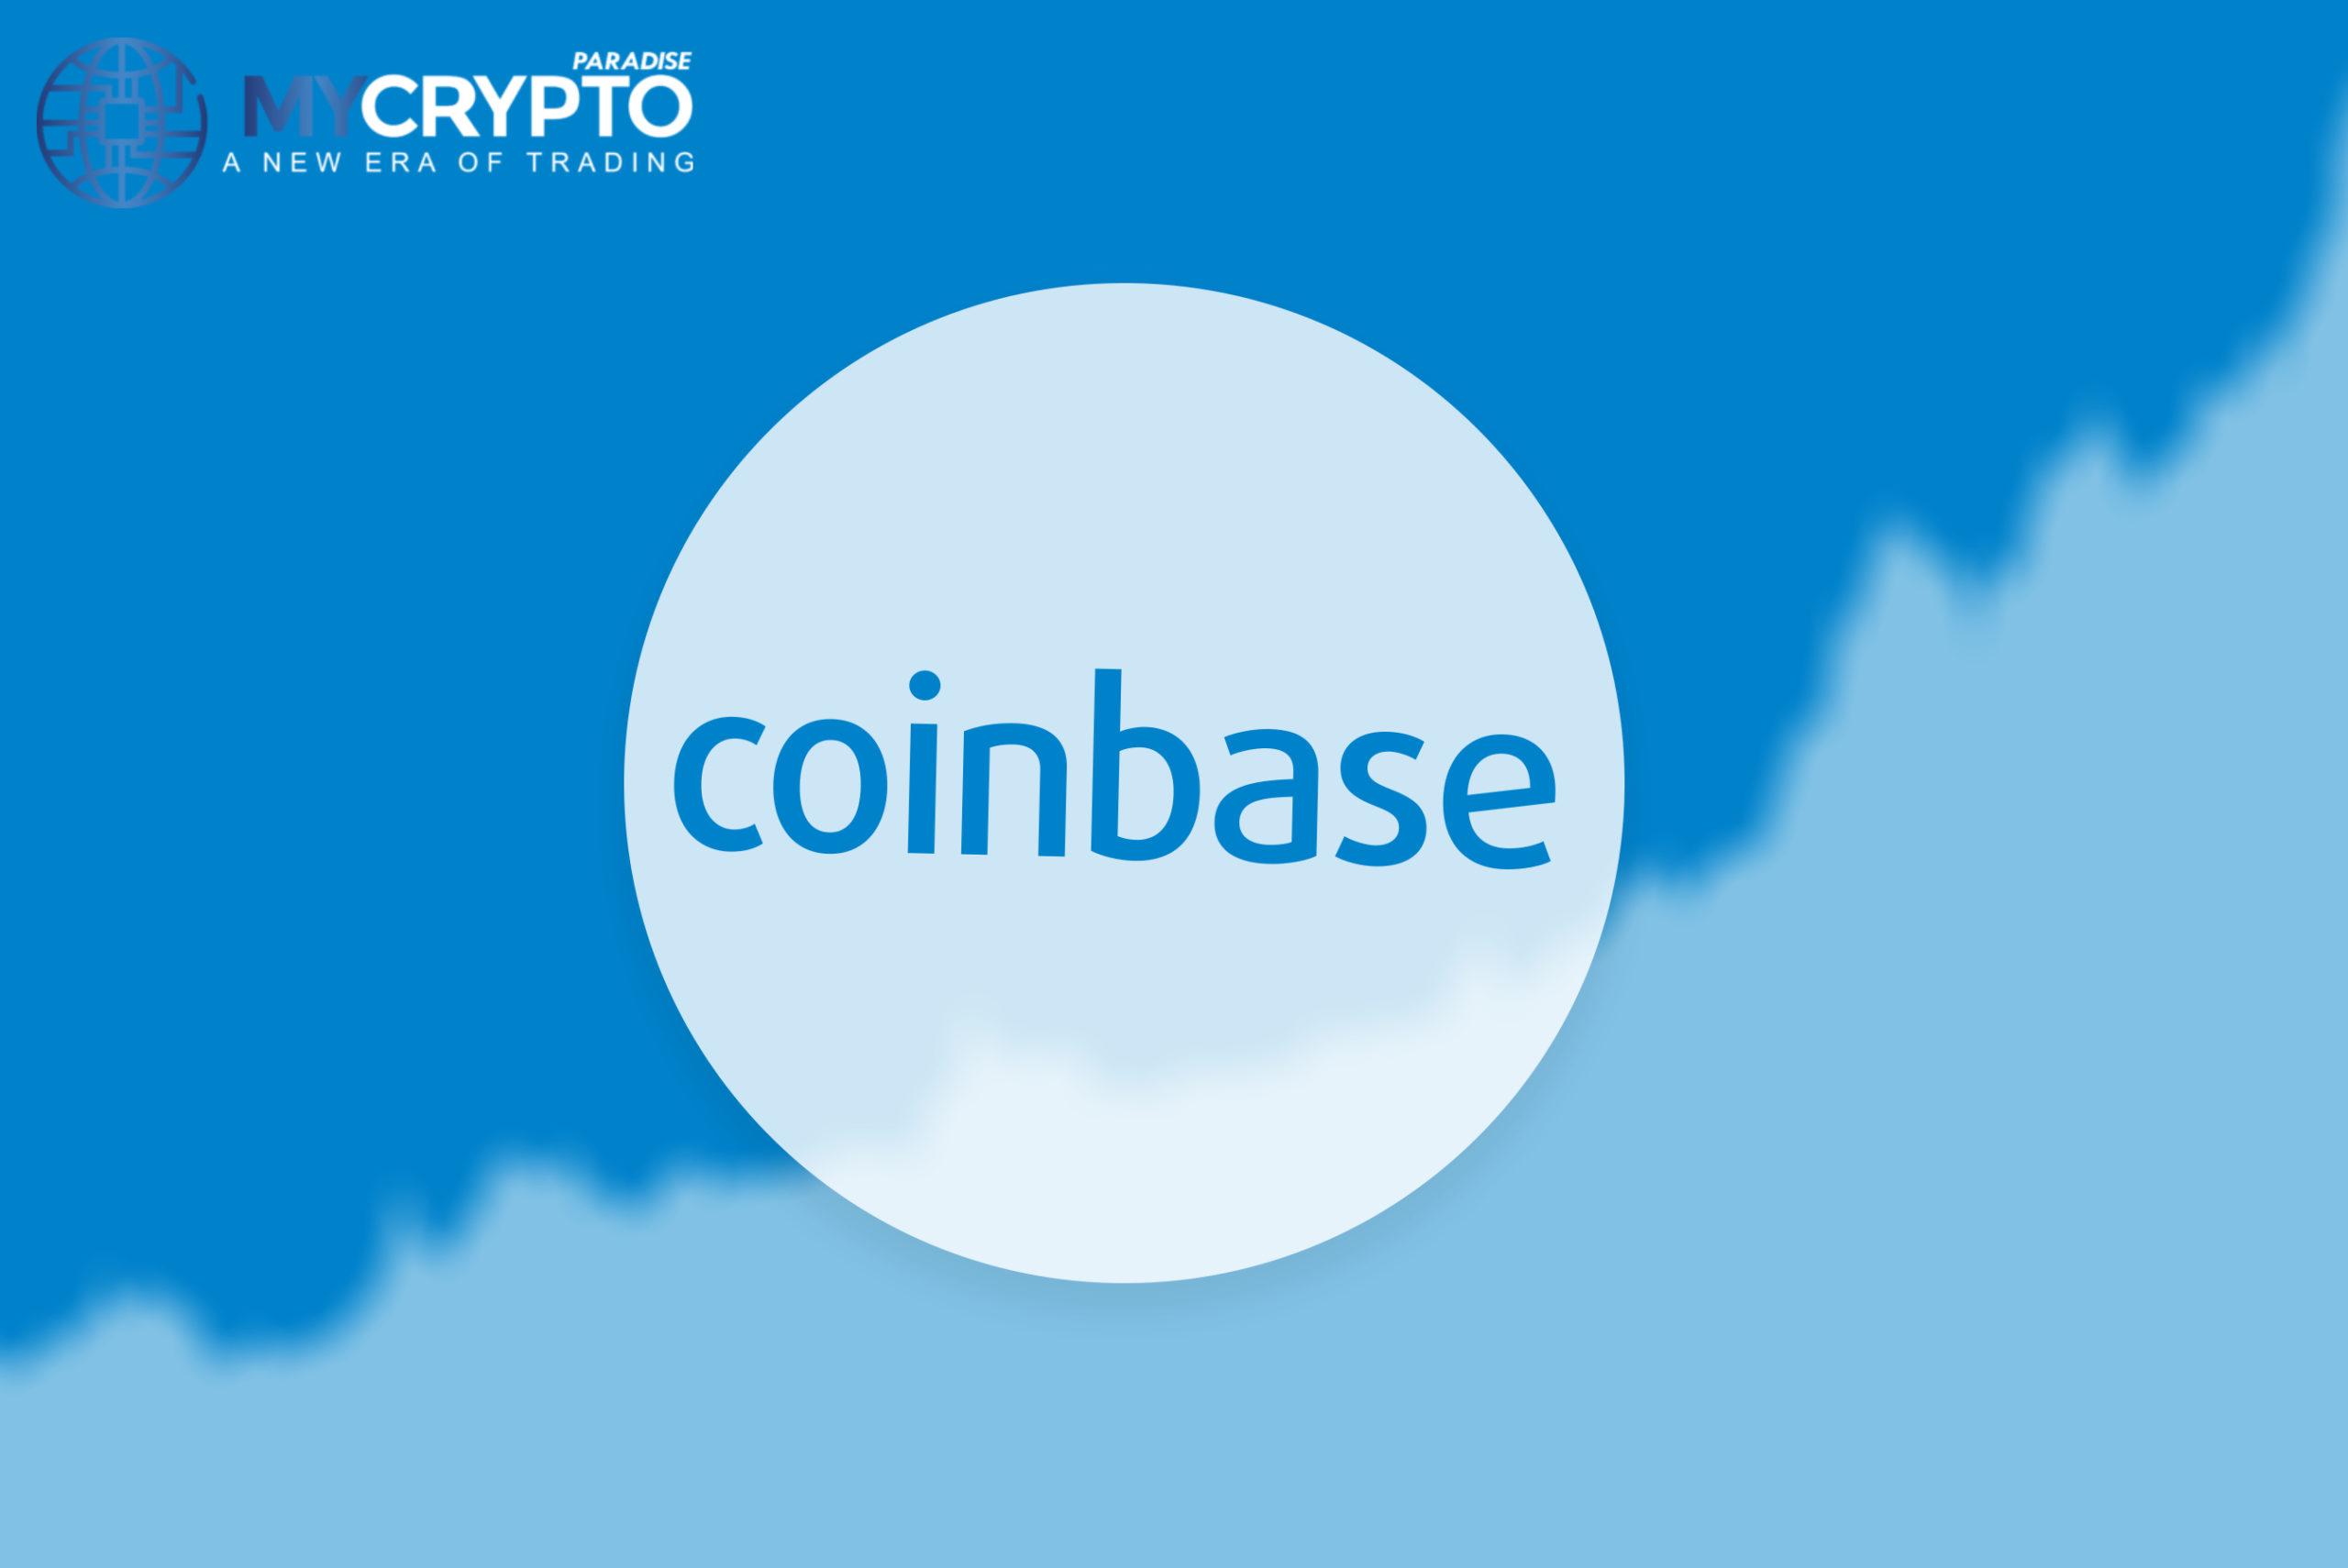 Coinbase Market Capitalization